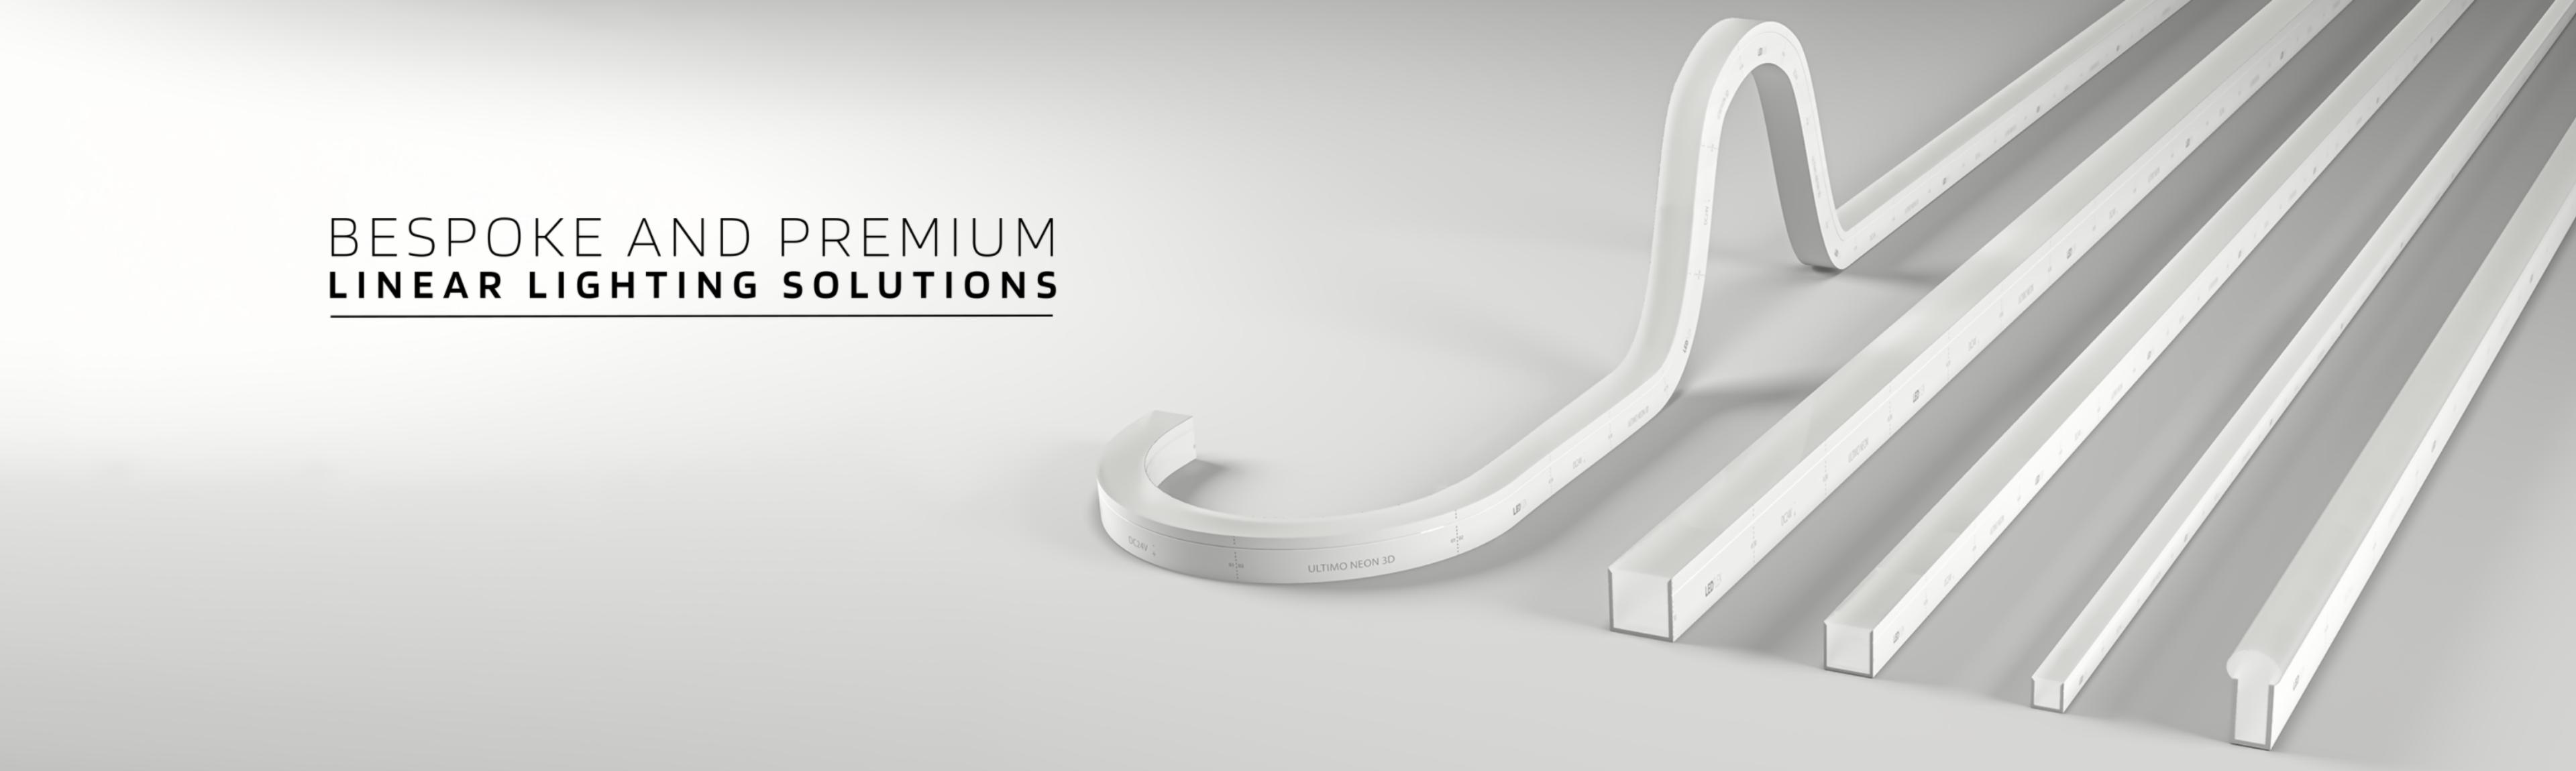 Bespoke & Premium Linerar Lighting Solutions